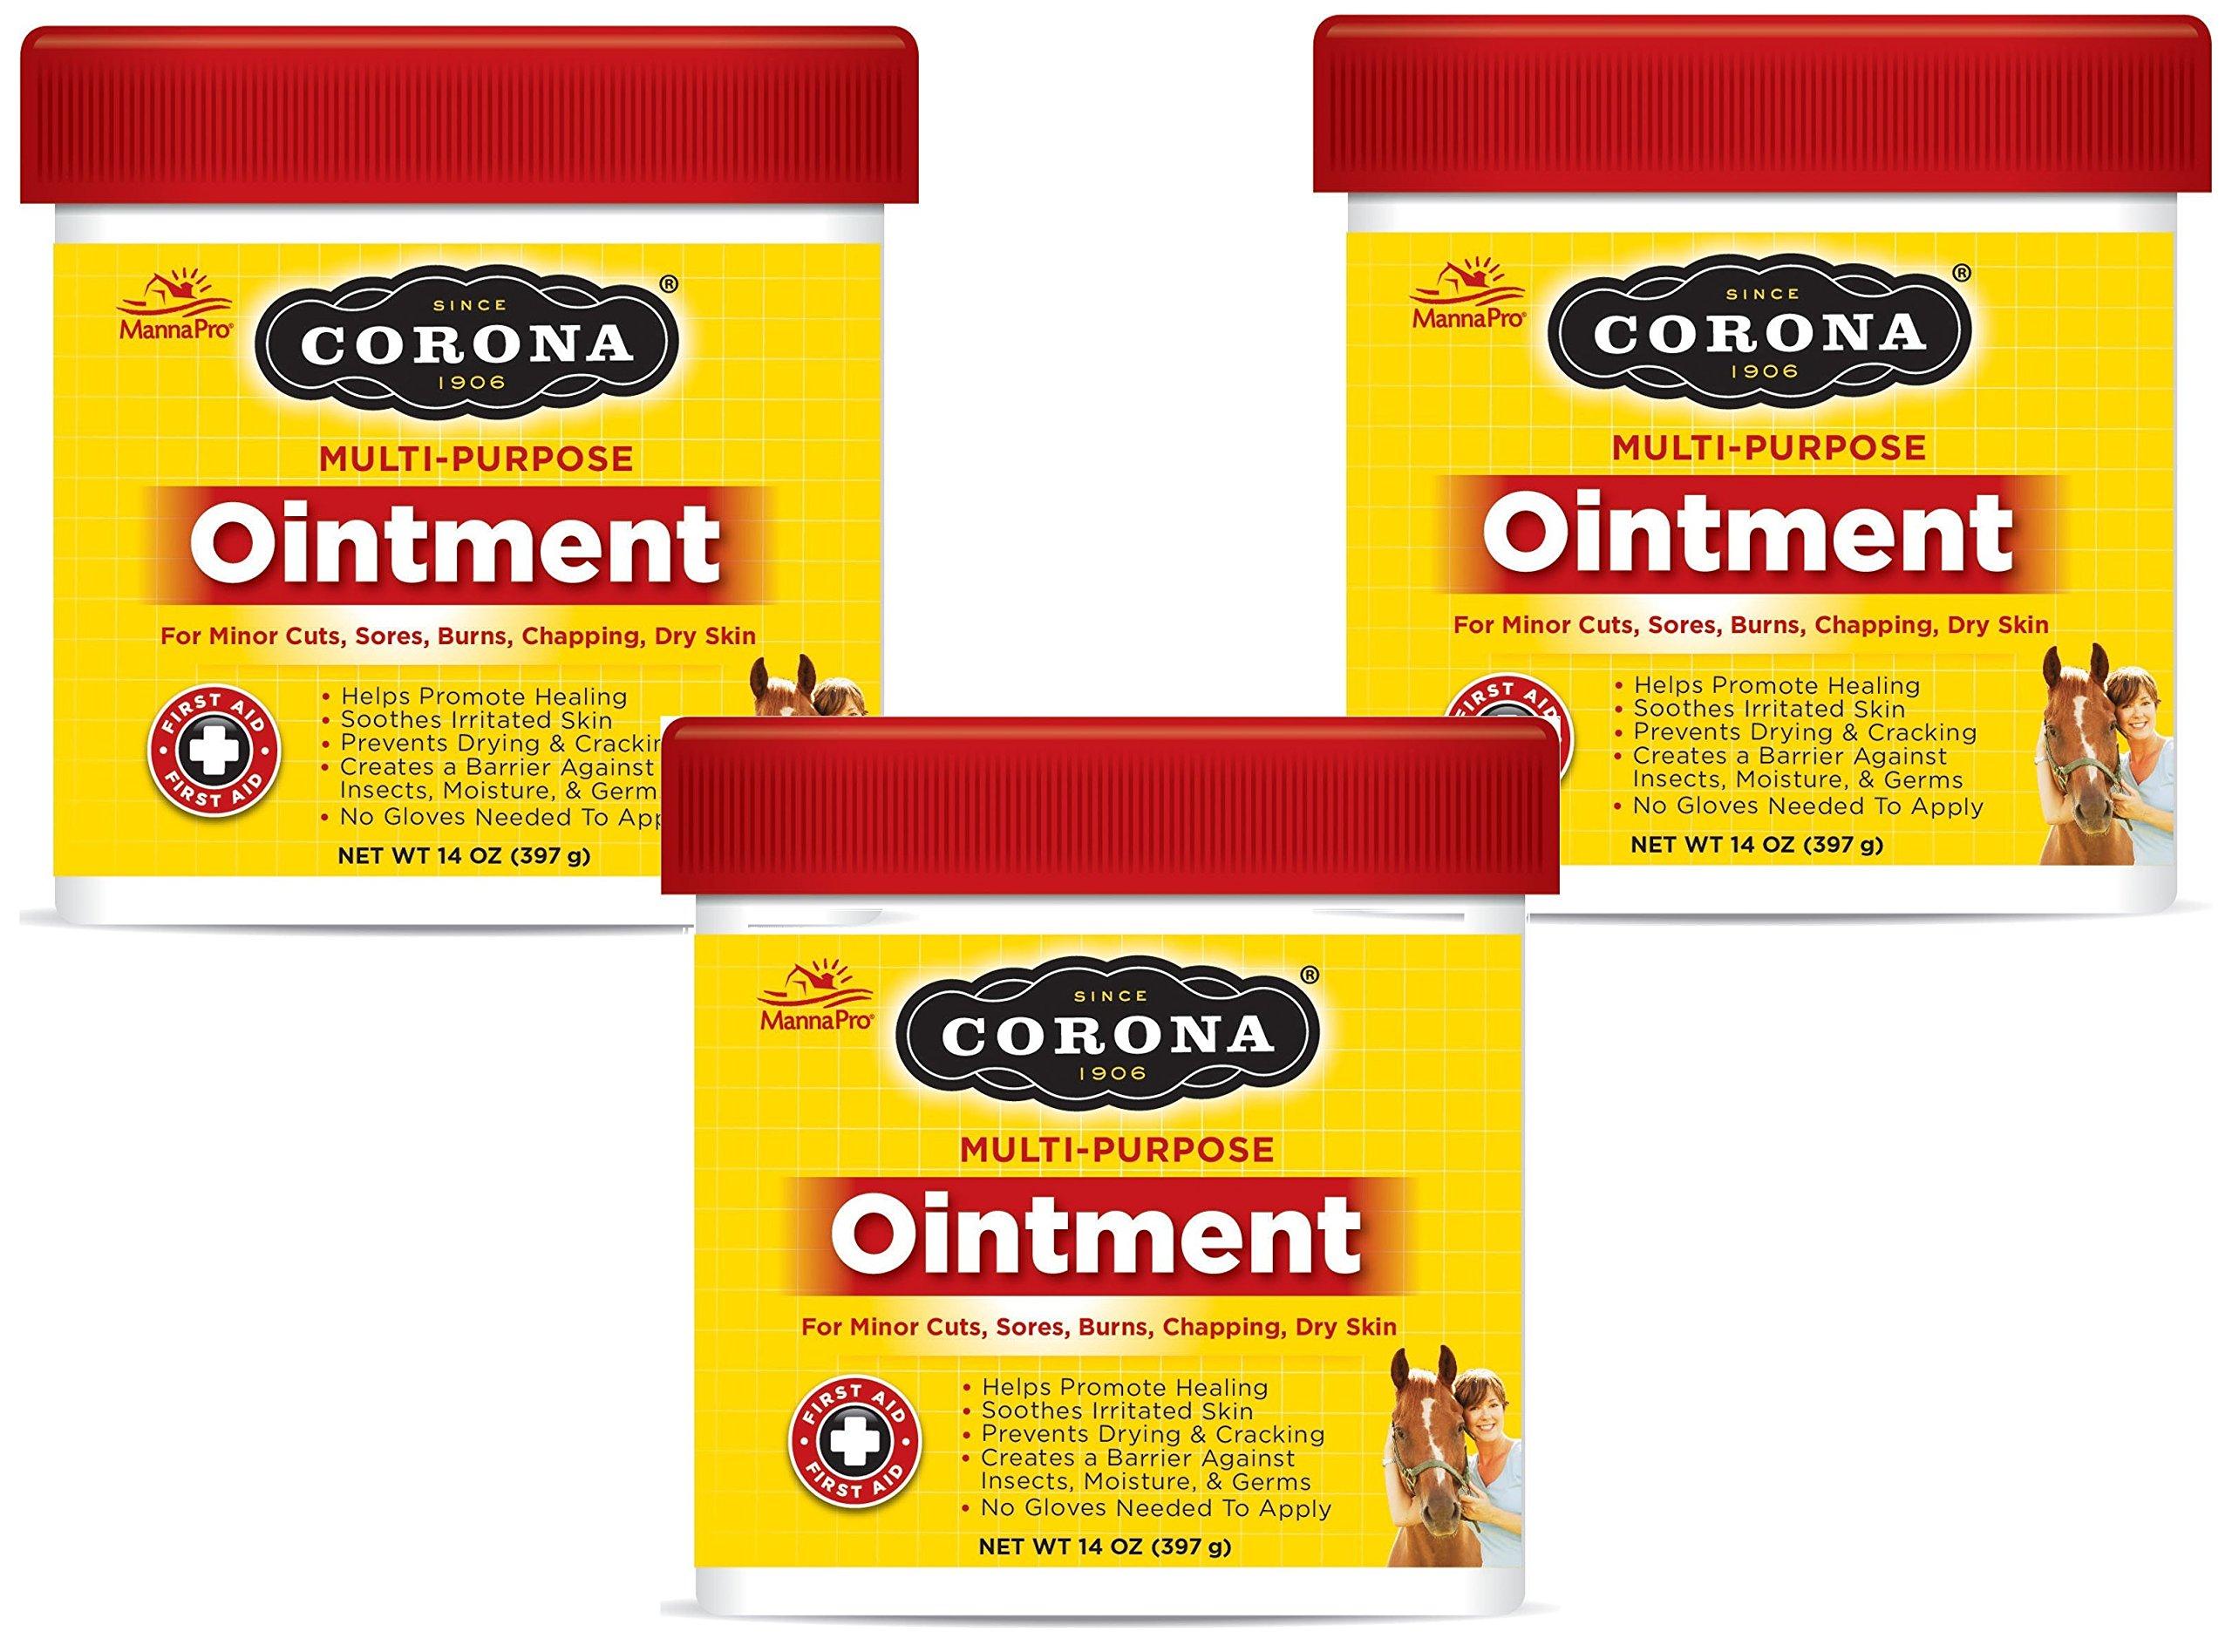 Corona Ointment 14 Oz., Jar (Pack of 3)